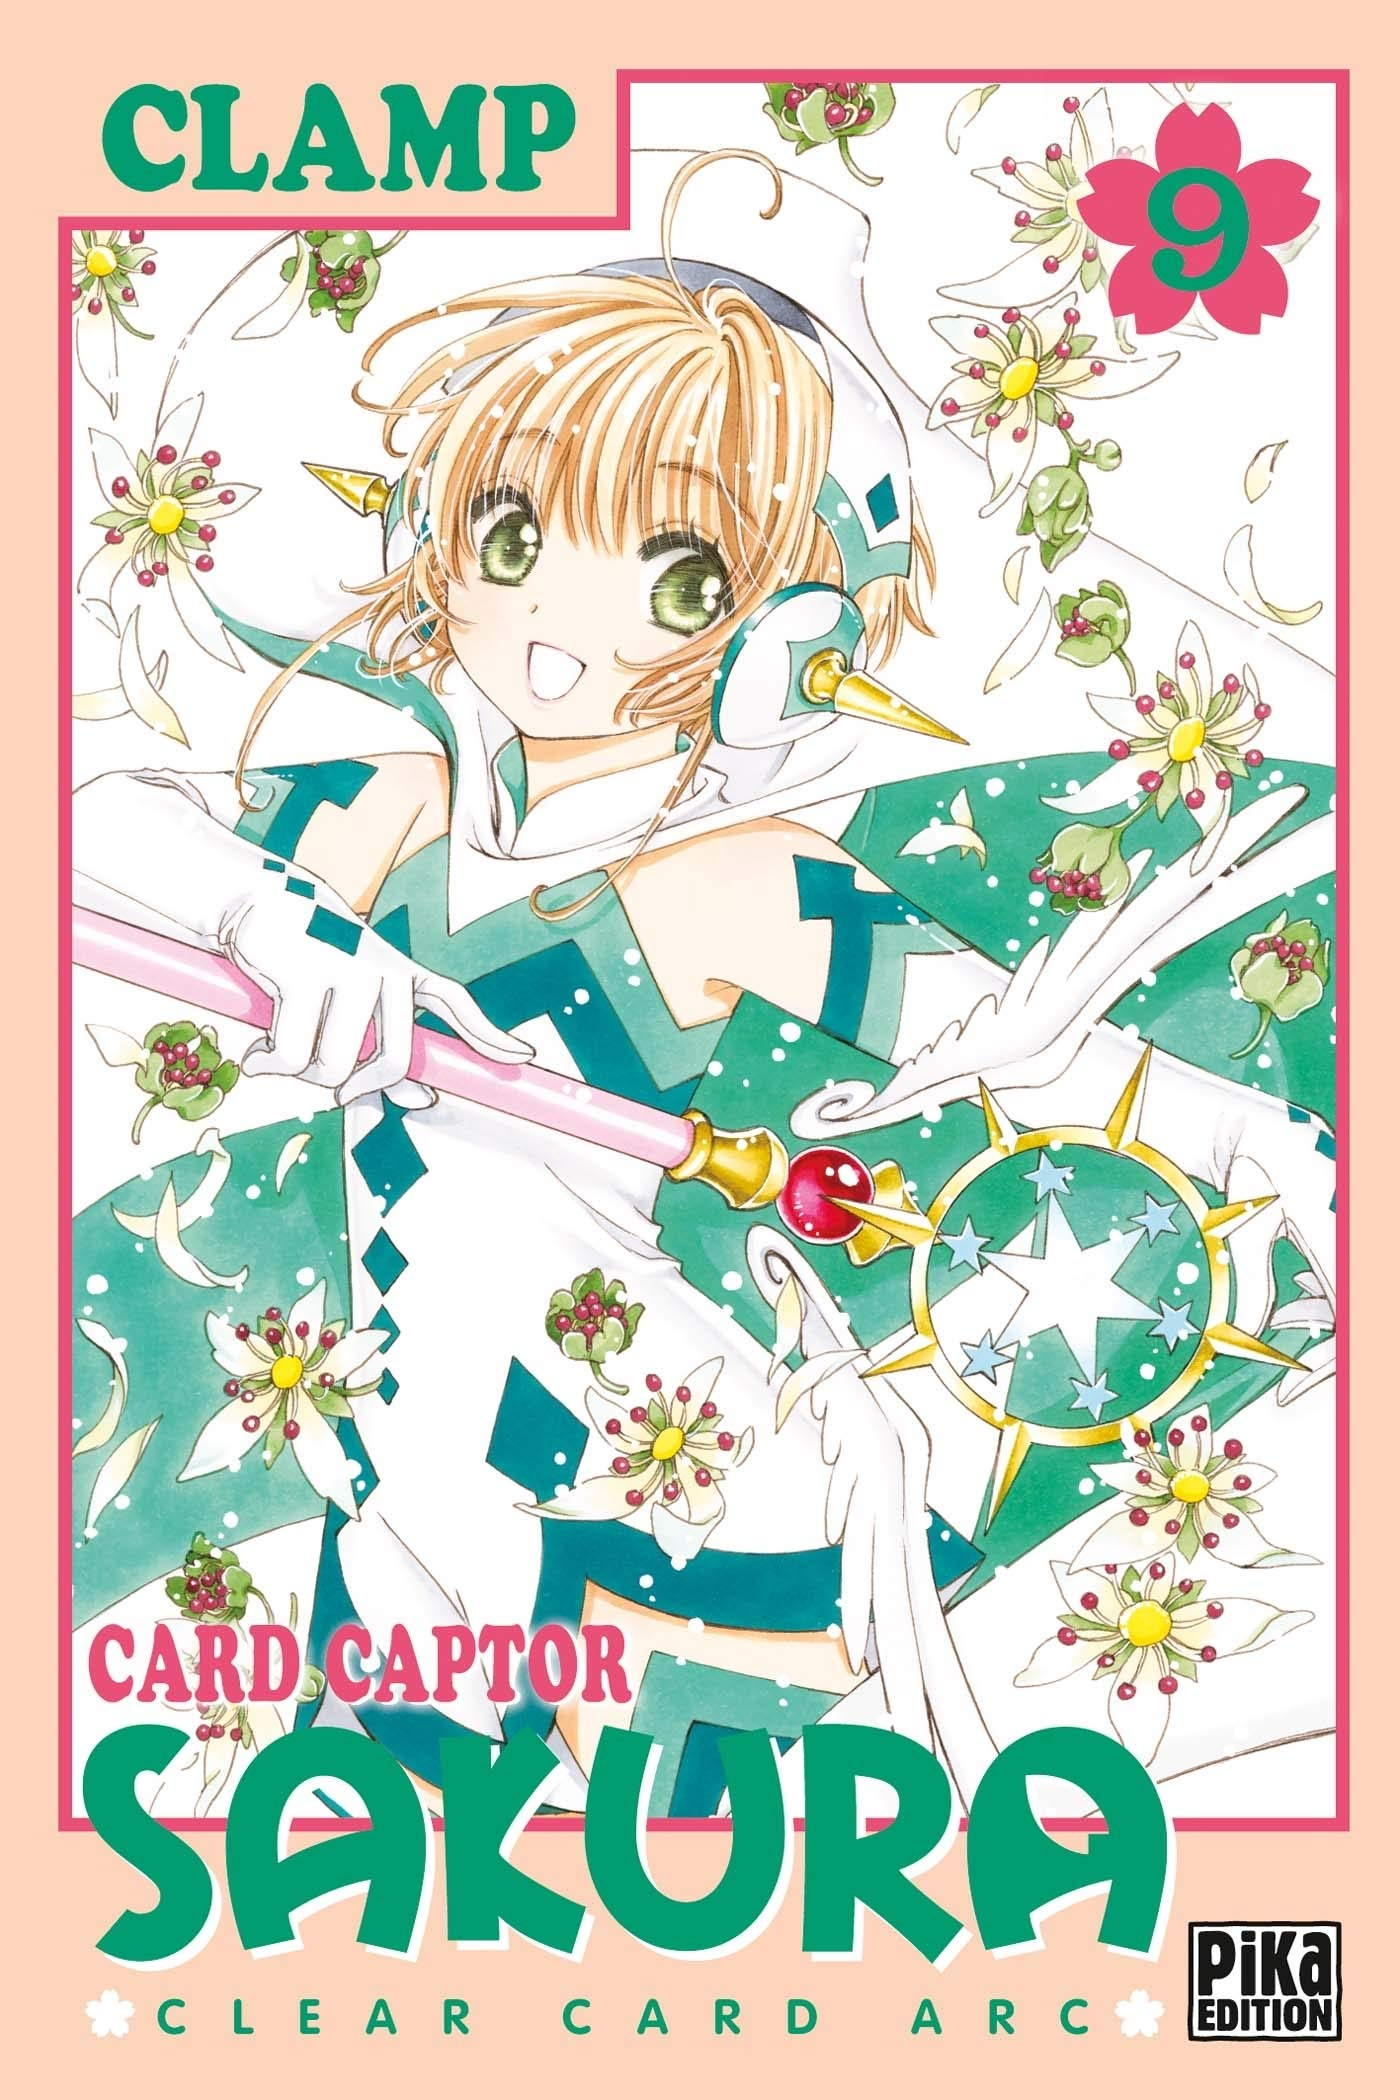 Card captor Sakura - Clear Card Arc 9